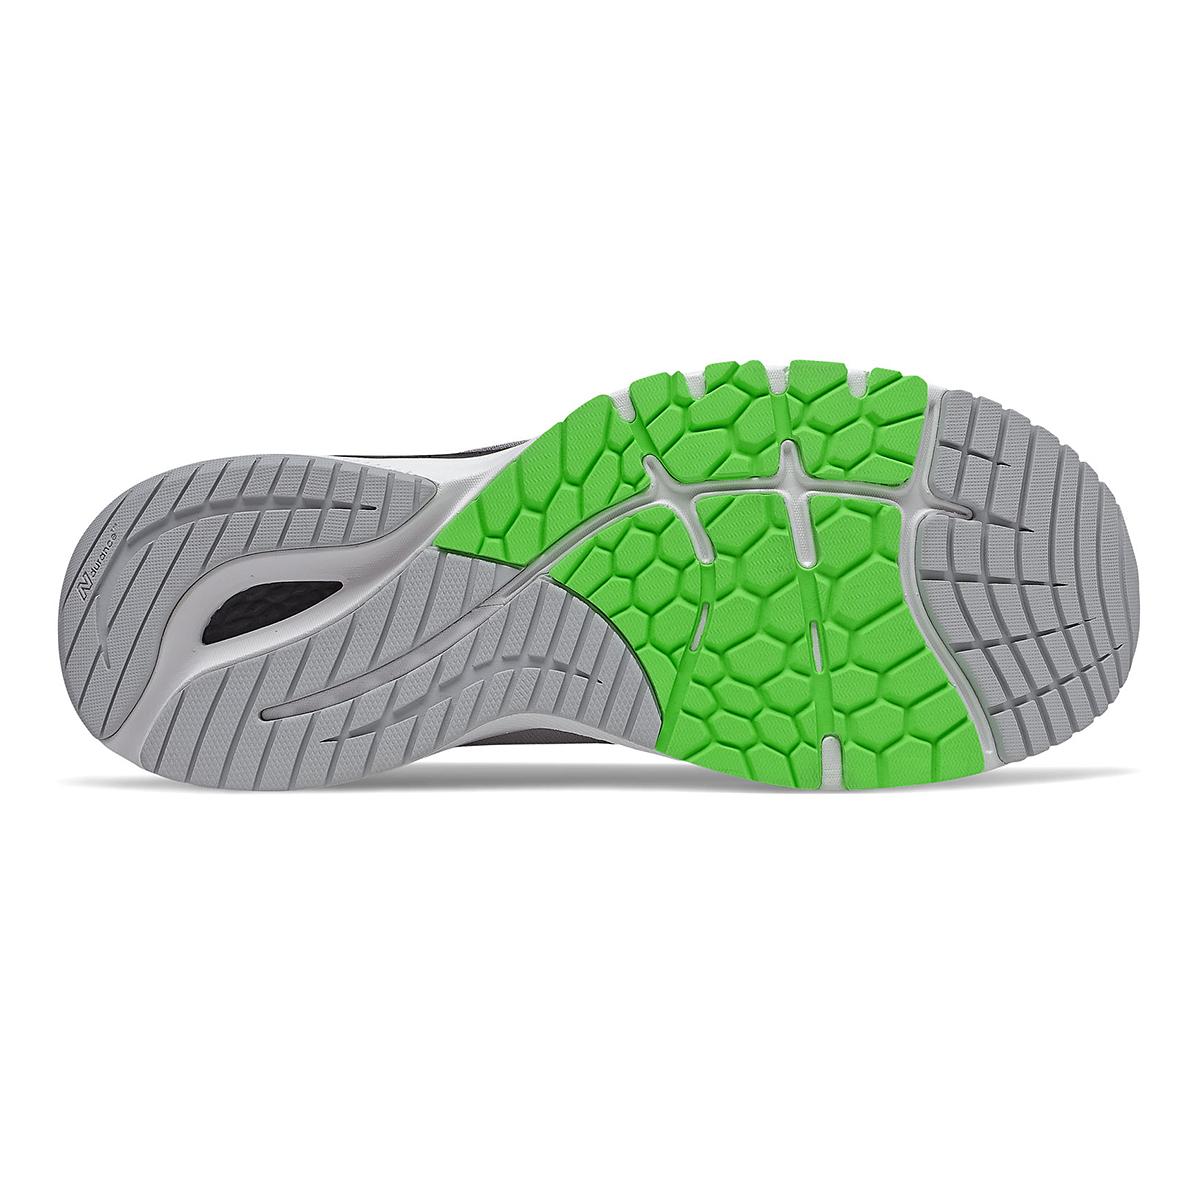 Men's New Balance 860V11 Running Shoe - Color: Light Aluminum/Black - Size: 6 - Width: Wide, Light Aluminum/Black, large, image 4